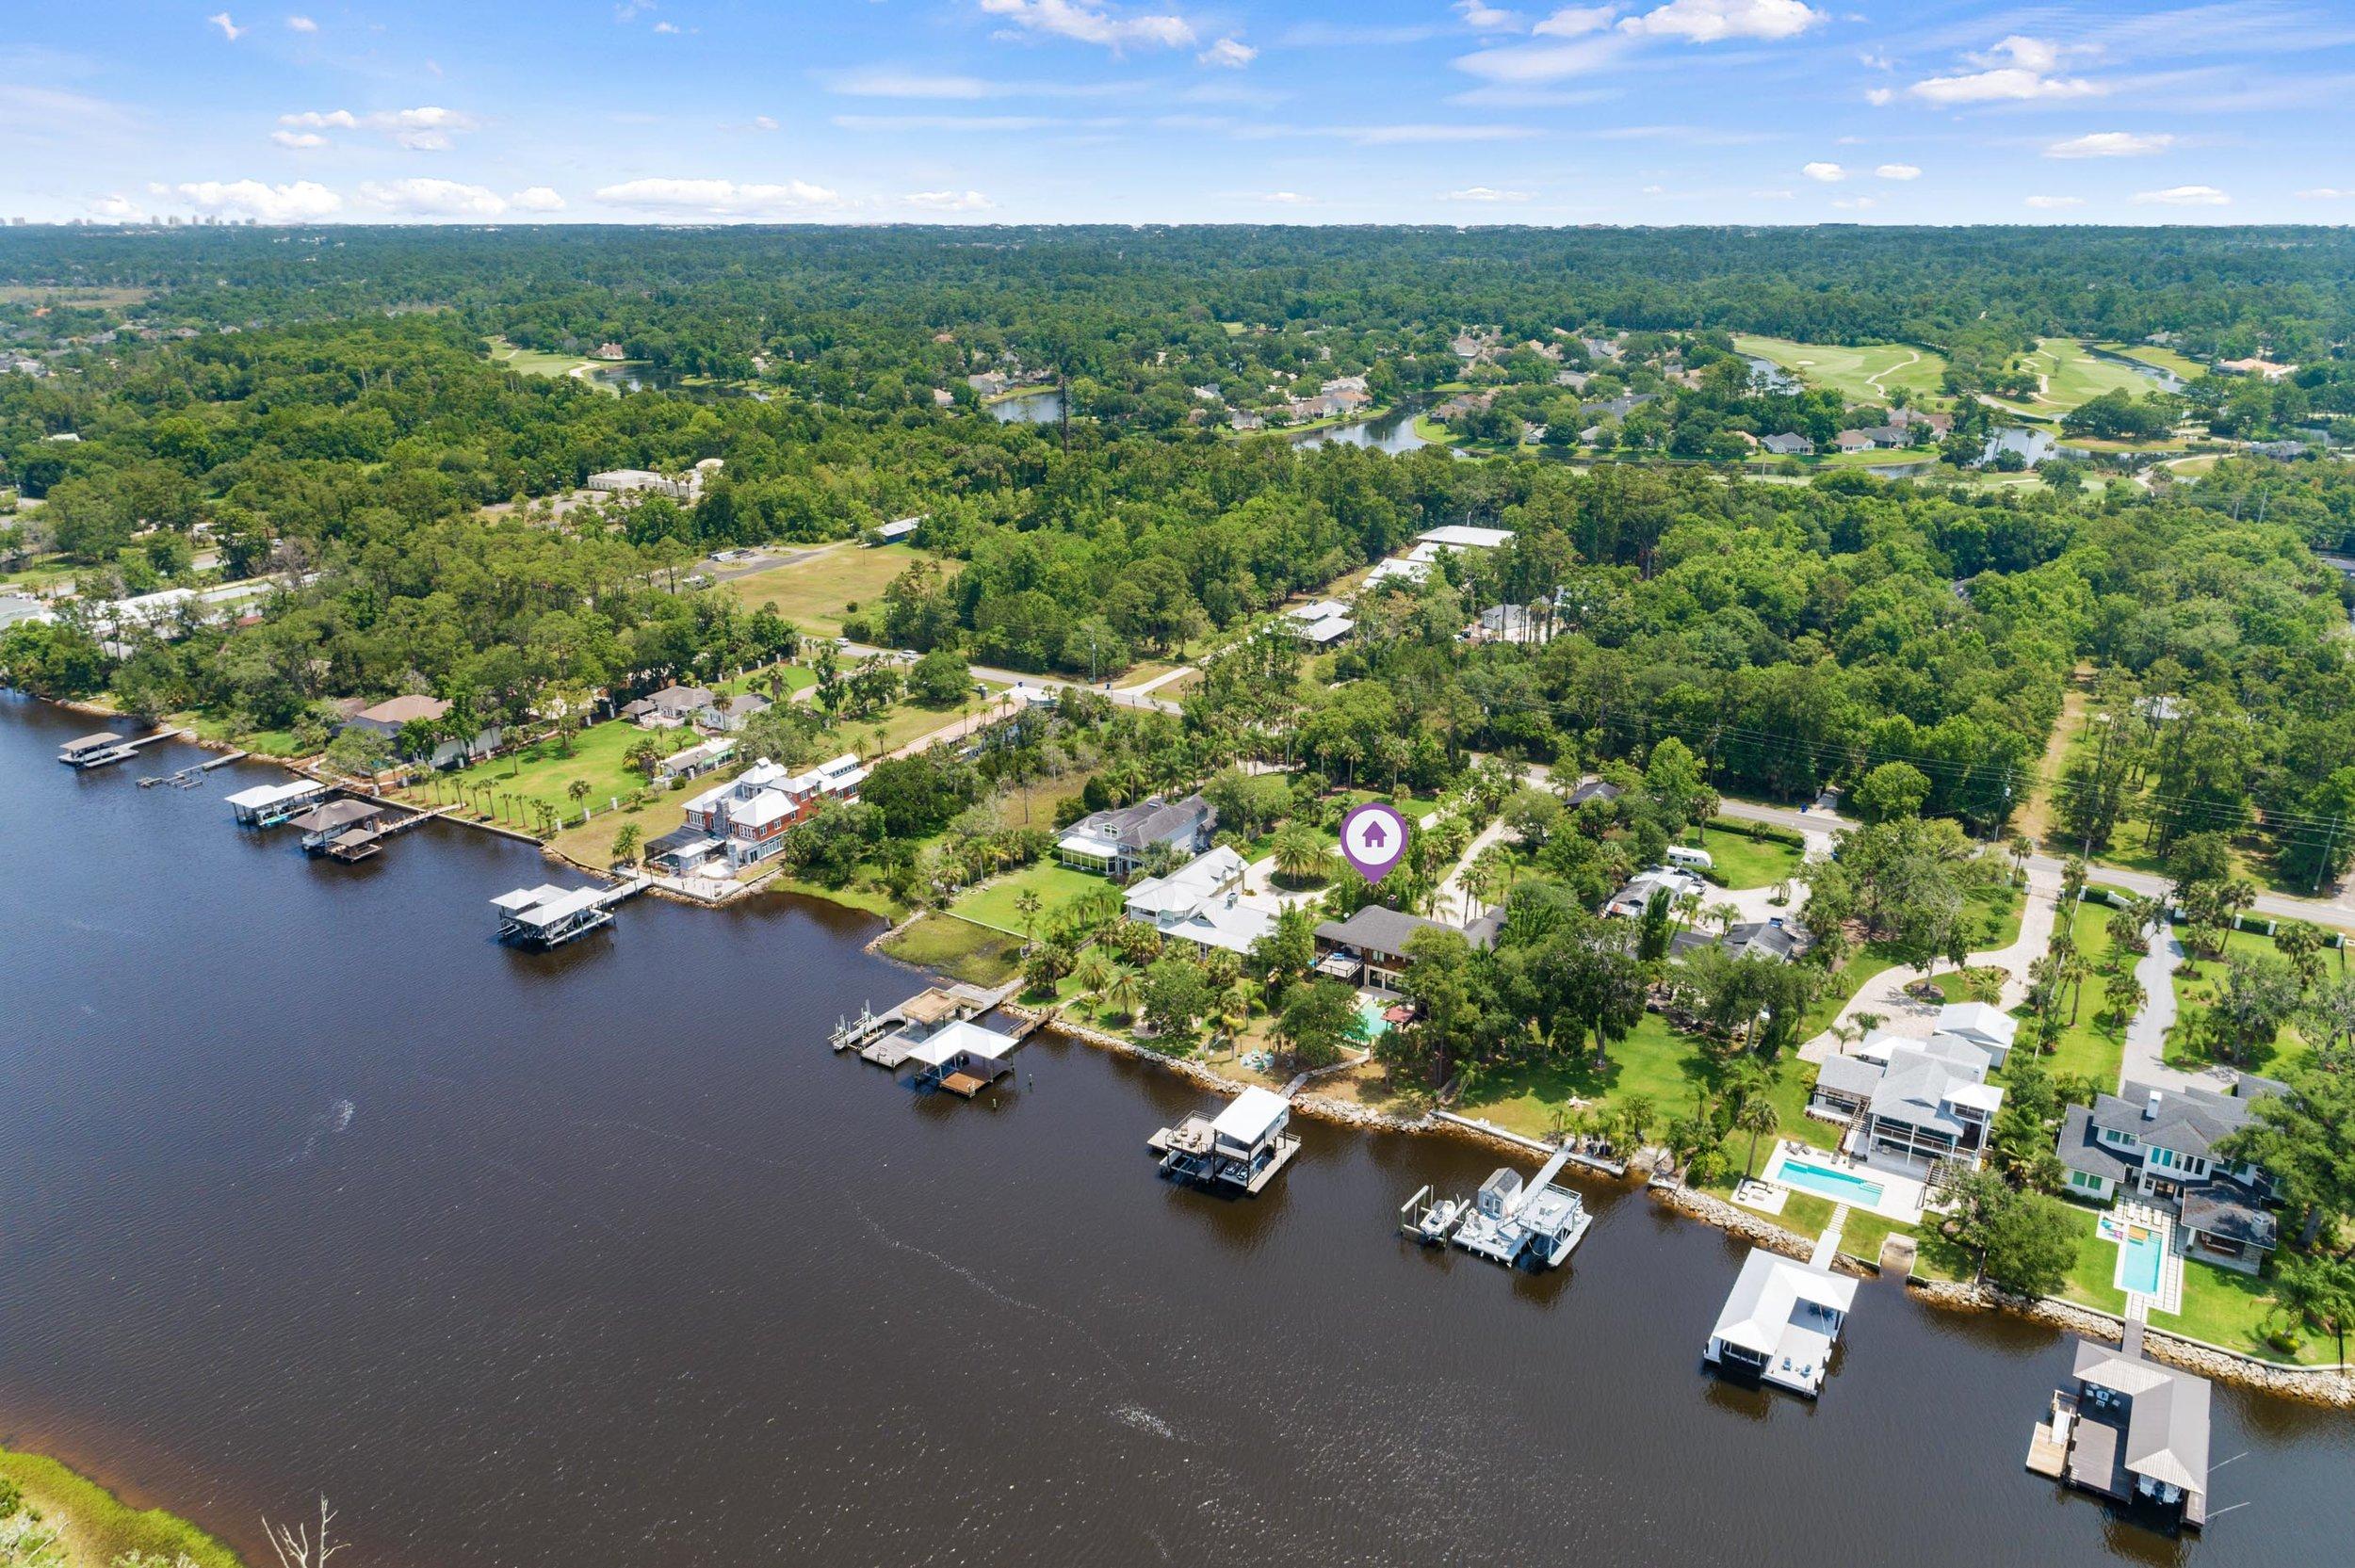 Saint Augustine Drone Photographer Aerial Video-002-7.jpg